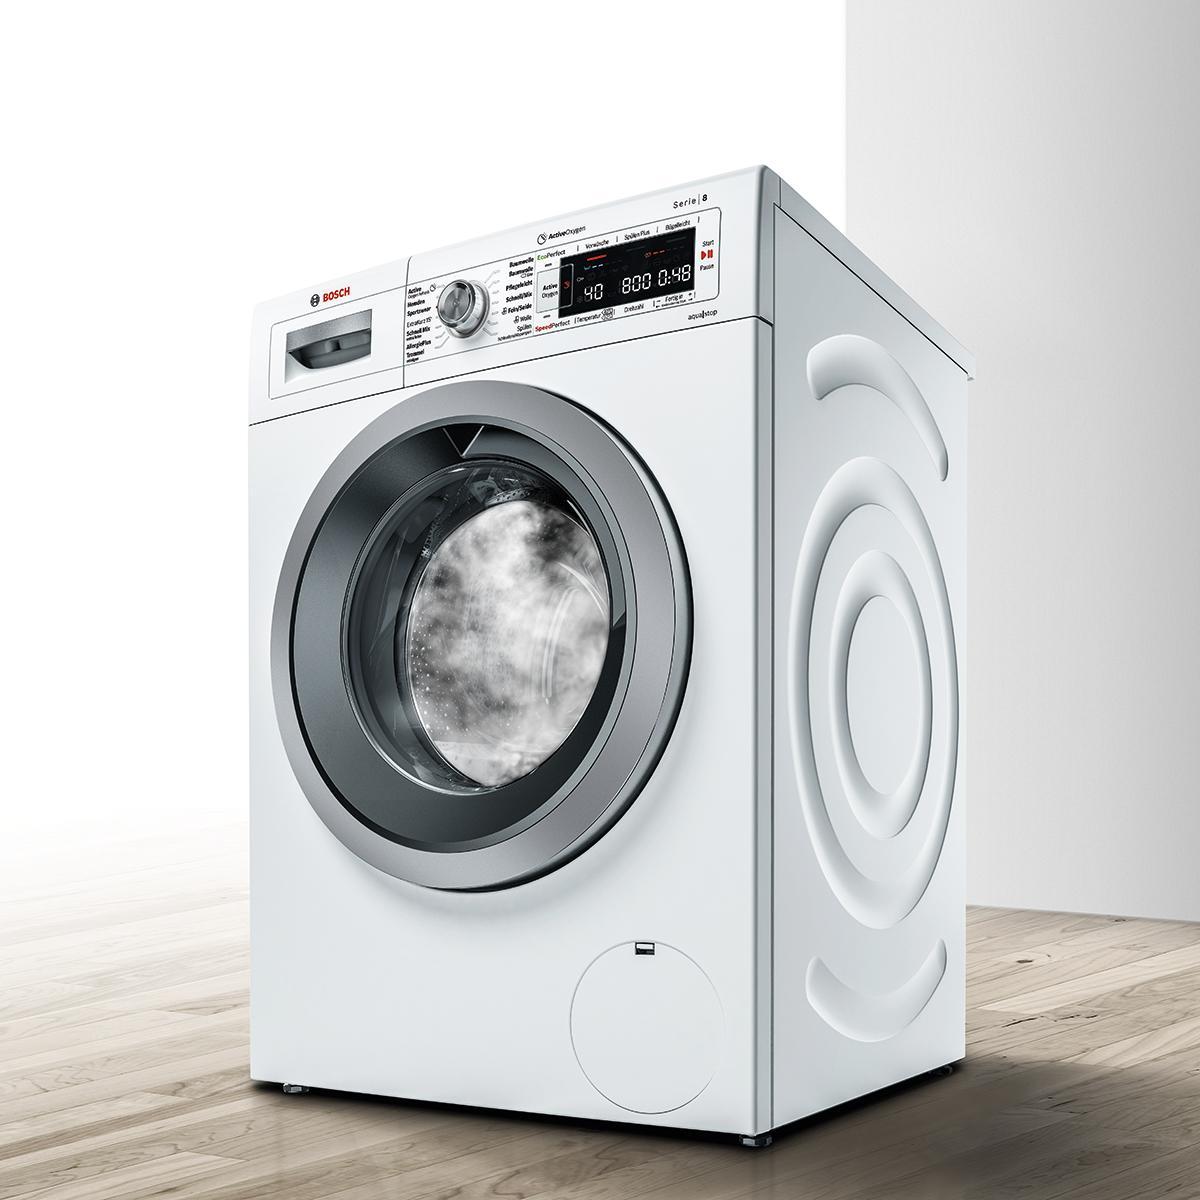 bosch wae283eco serie 4 waschmaschine frontlader a. Black Bedroom Furniture Sets. Home Design Ideas